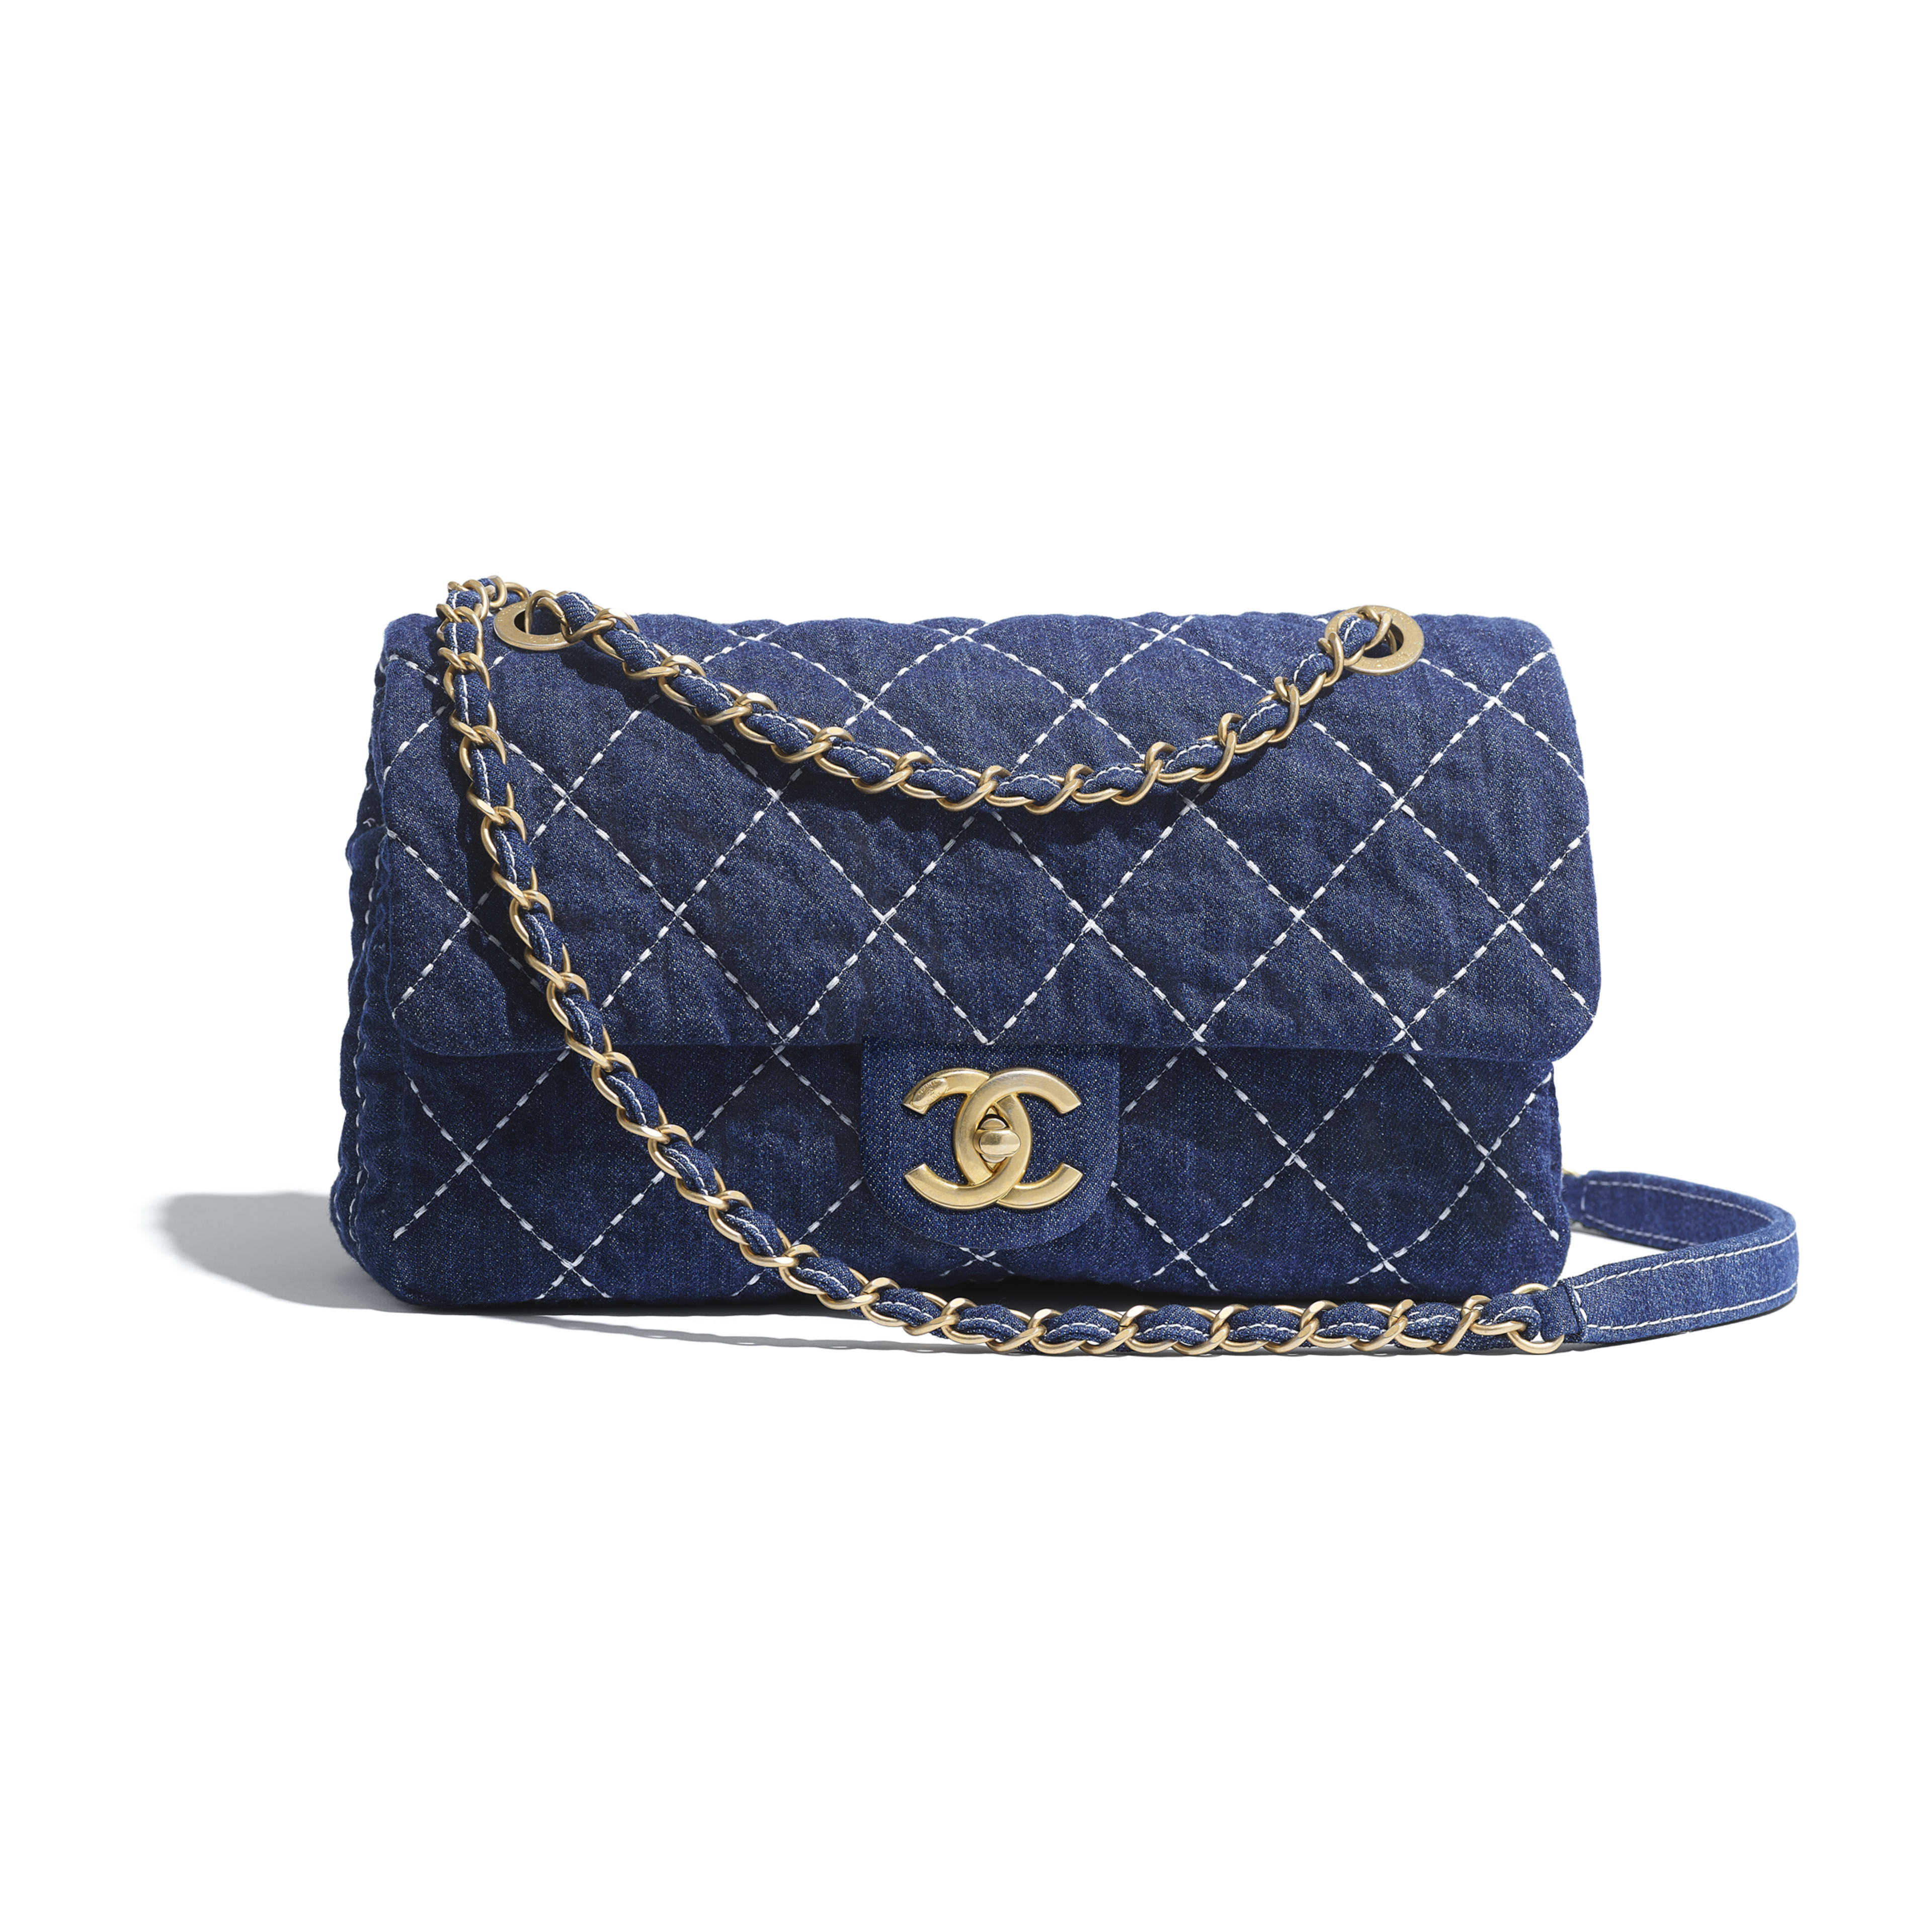 Flap Bag - Blue - Denim & Gold Metal - Default view - see full sized version